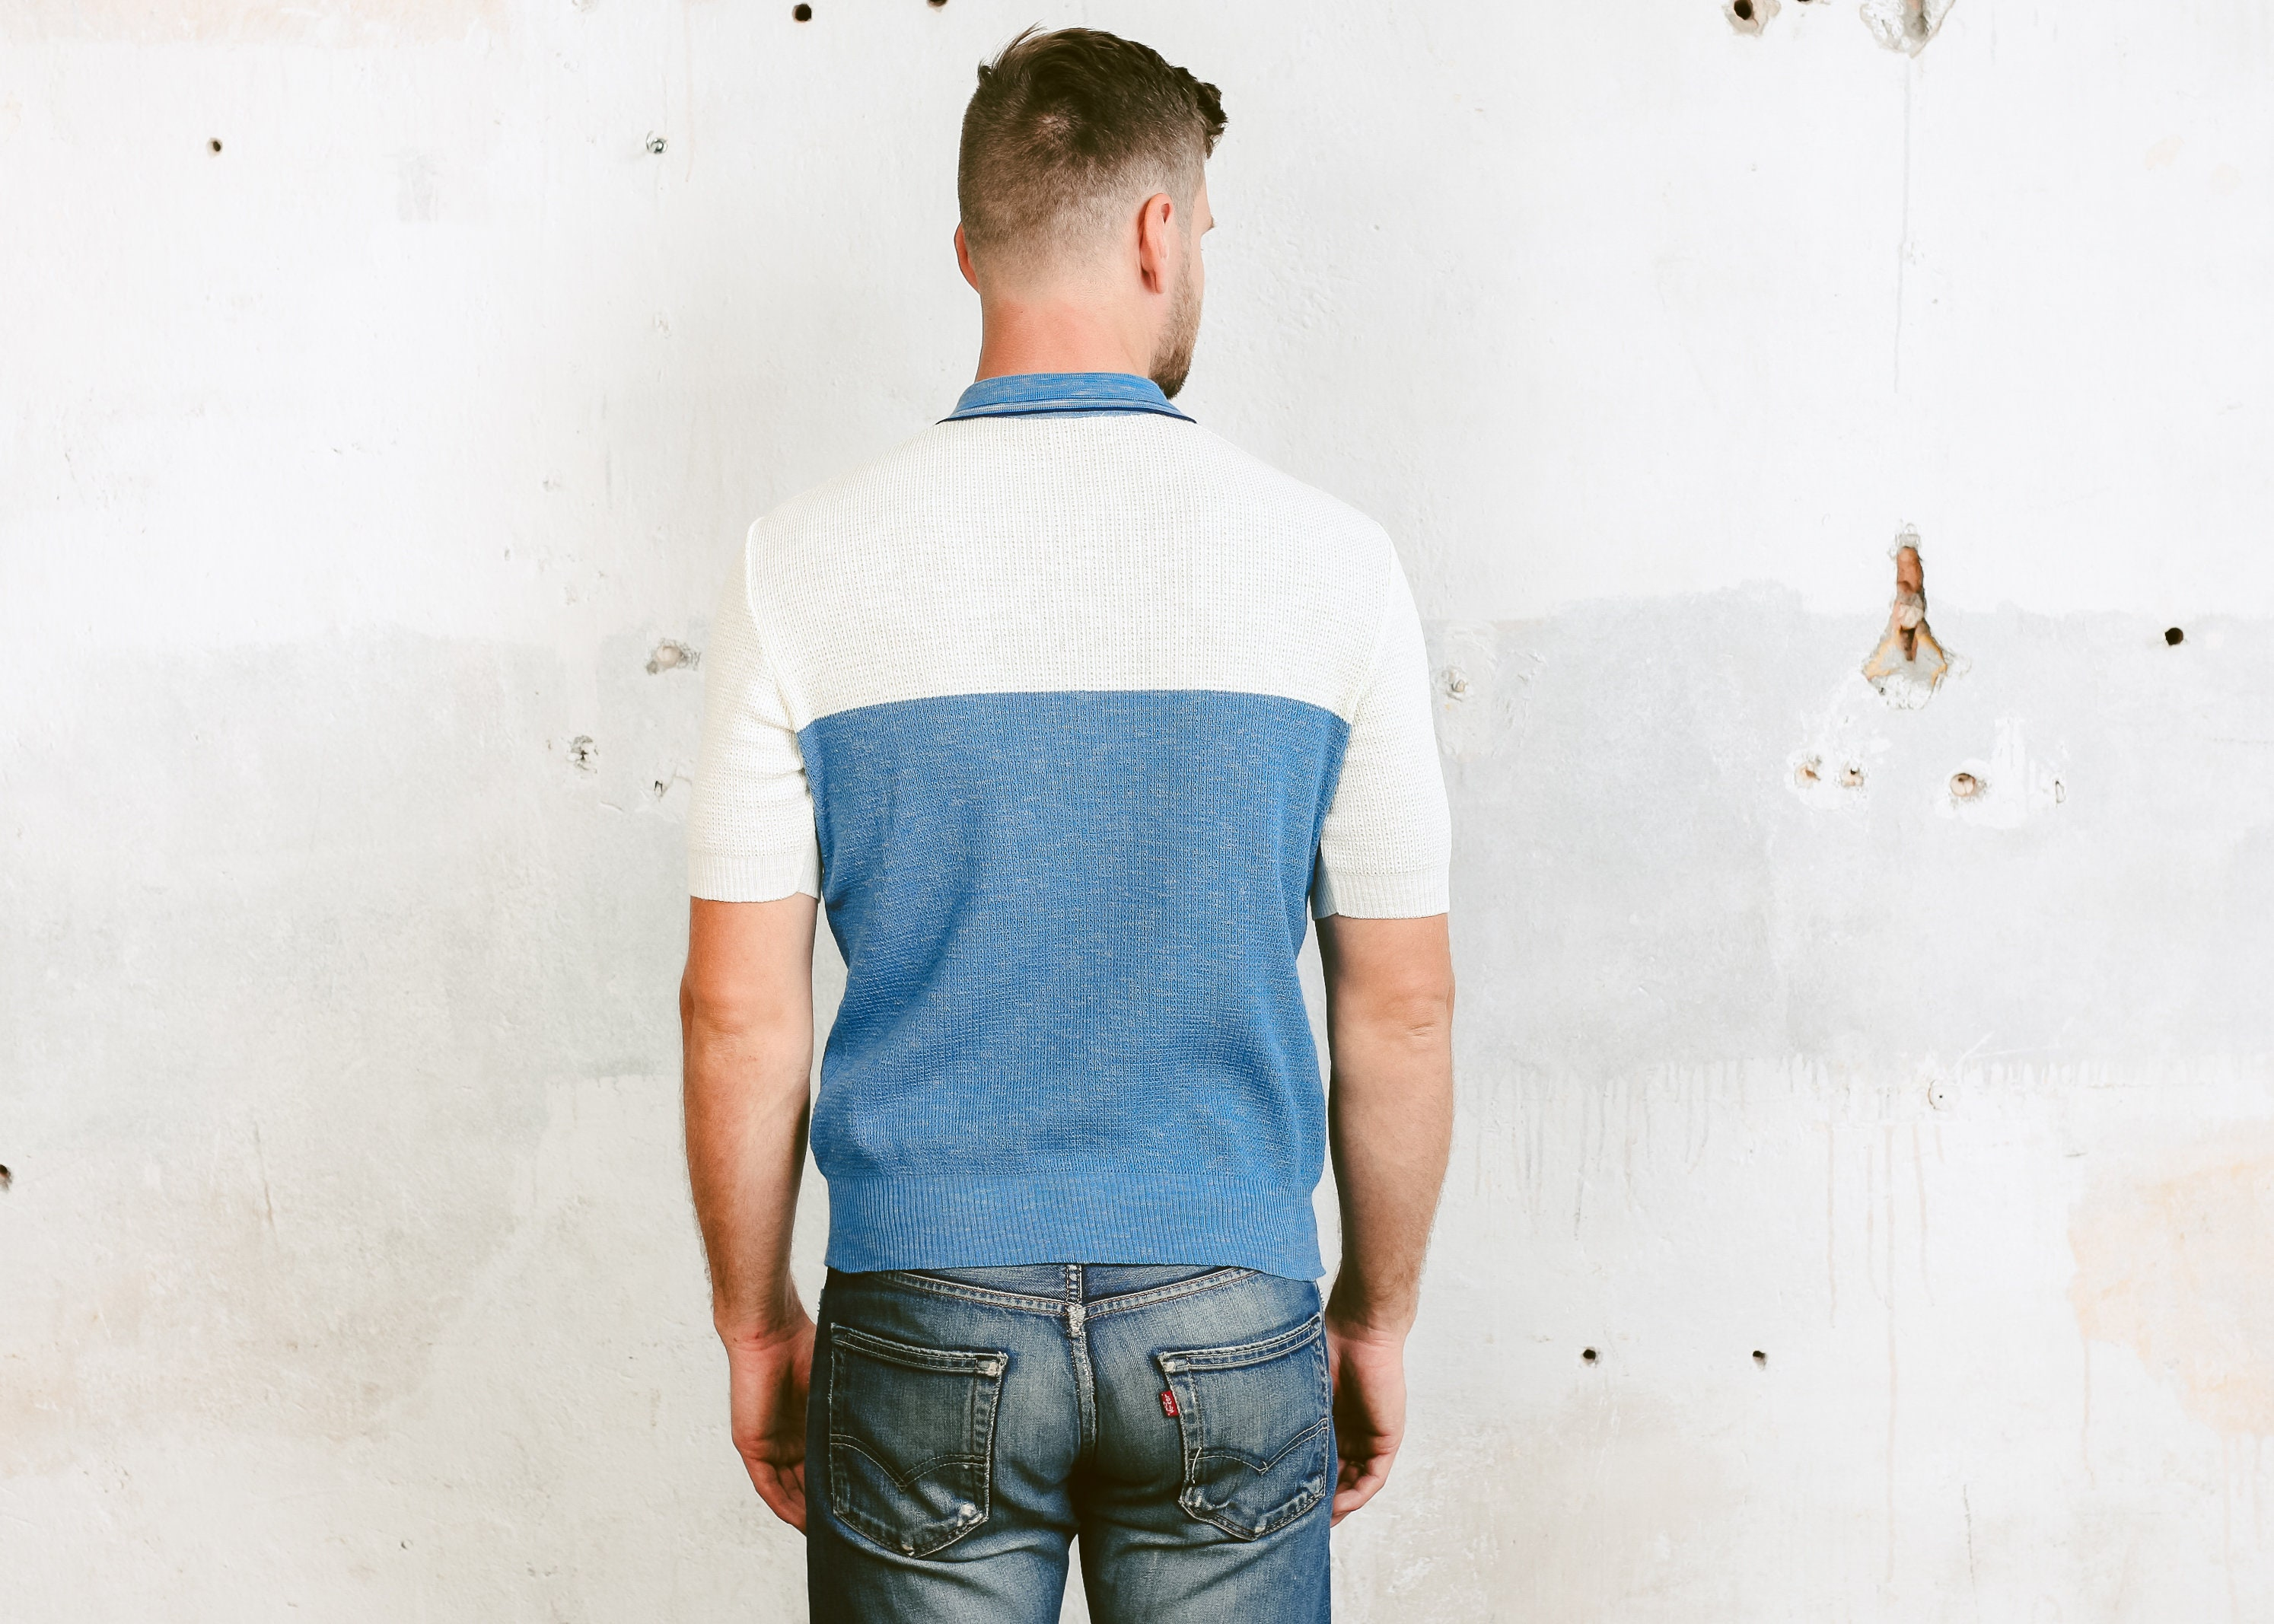 1bd797e62 Vintage 70s Mens Polo Shirt . Blue White Retro Sports Top Bowling Shirt  Golf Tennis Rockabilly Mesh T-shirt Short Sleeve Shirt . size Medium